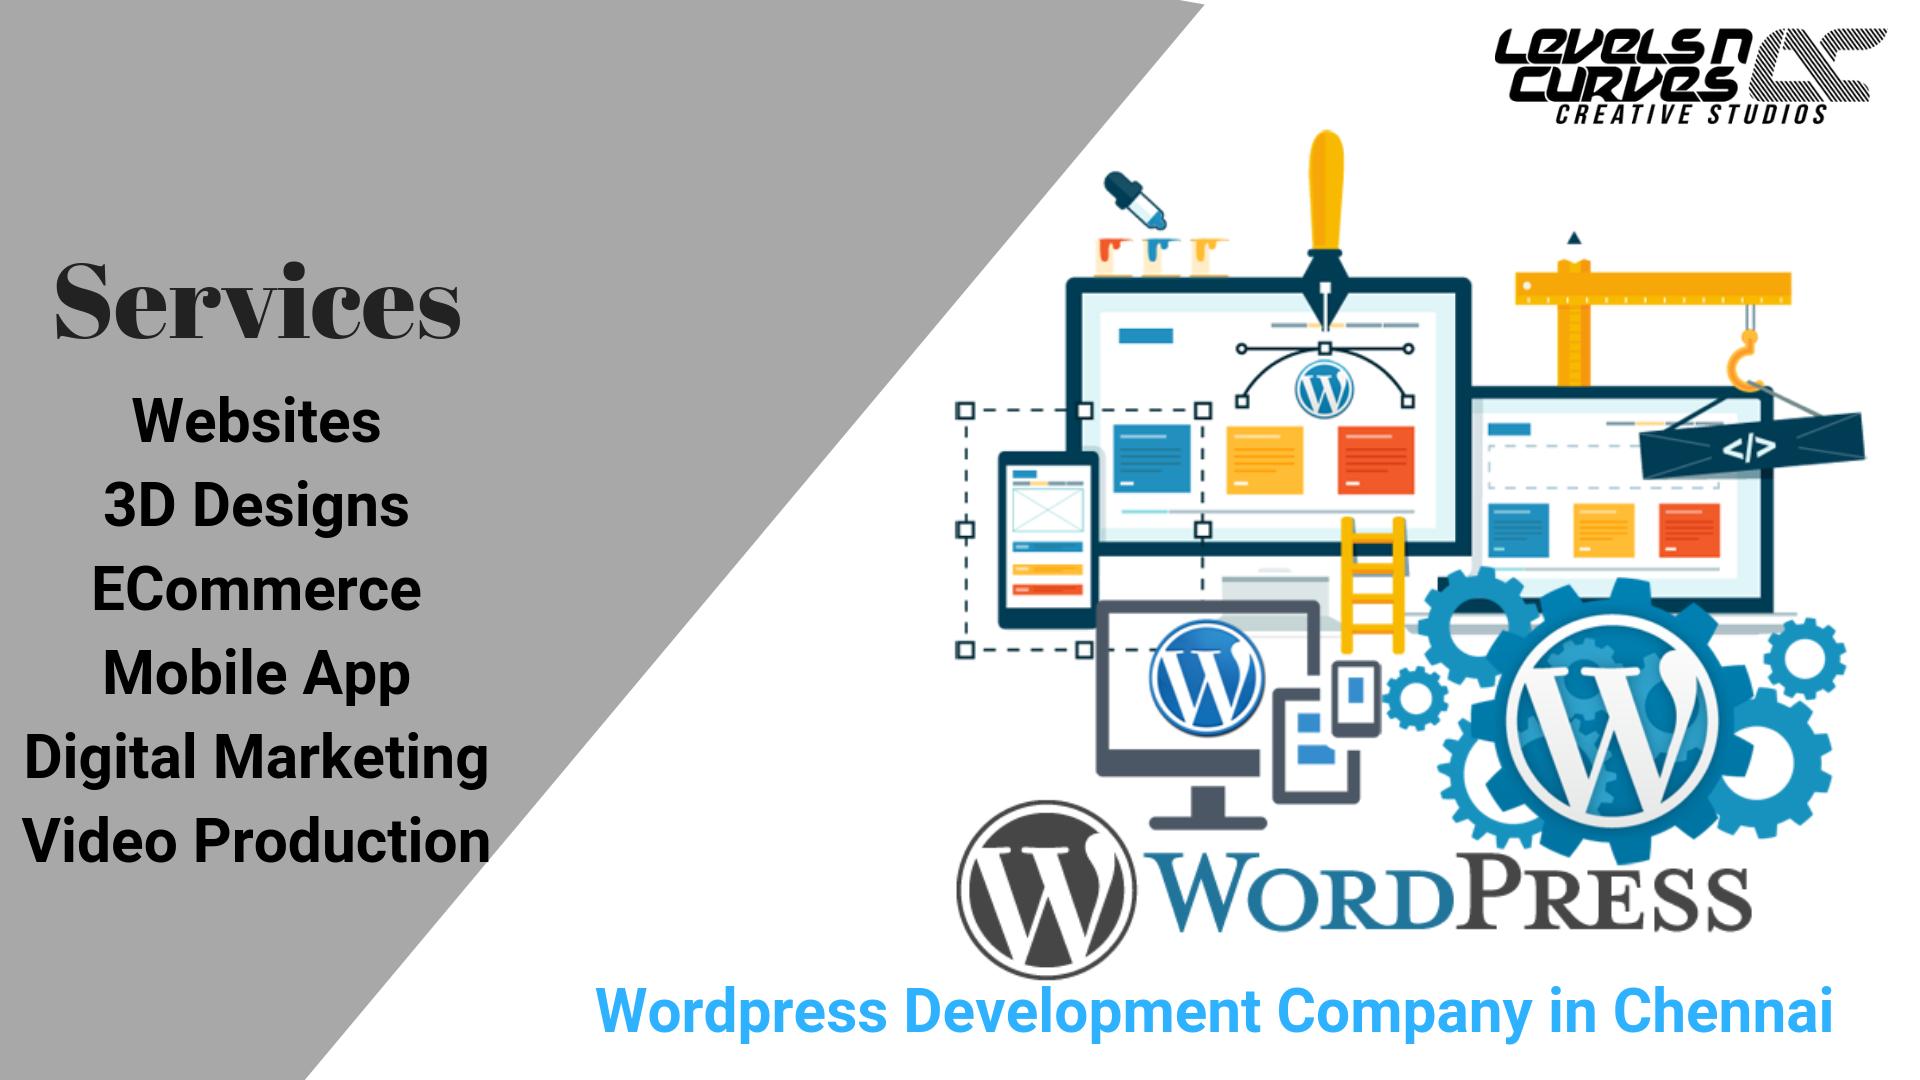 Web Design Company In Chennai India With Images Web Design Web Design Company Web Design Services